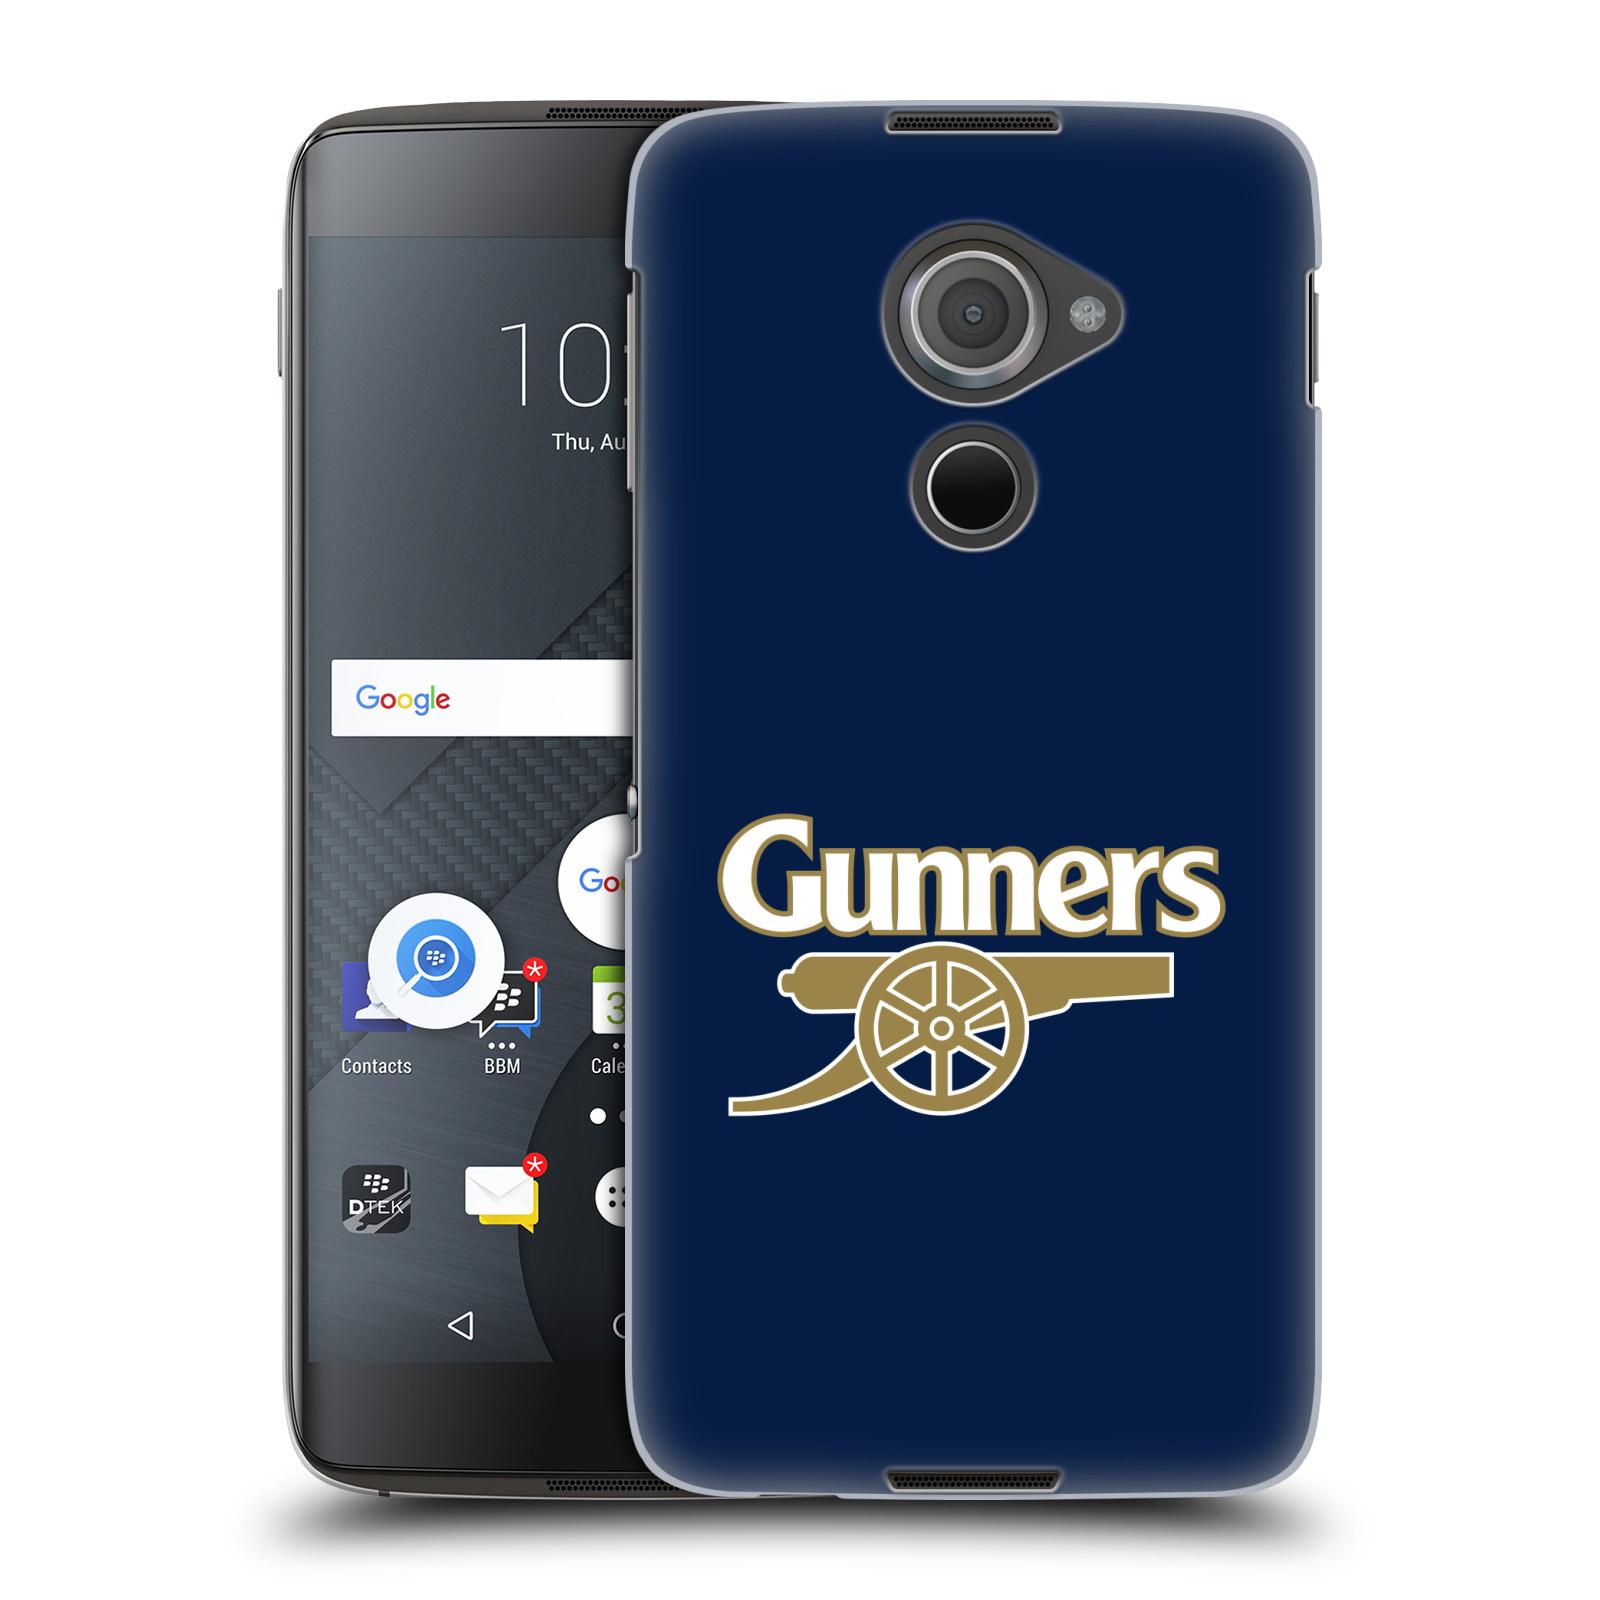 Plastové pouzdro na mobil Blackberry DTEK60 (Argon) - Head Case - Arsenal FC - Gunners